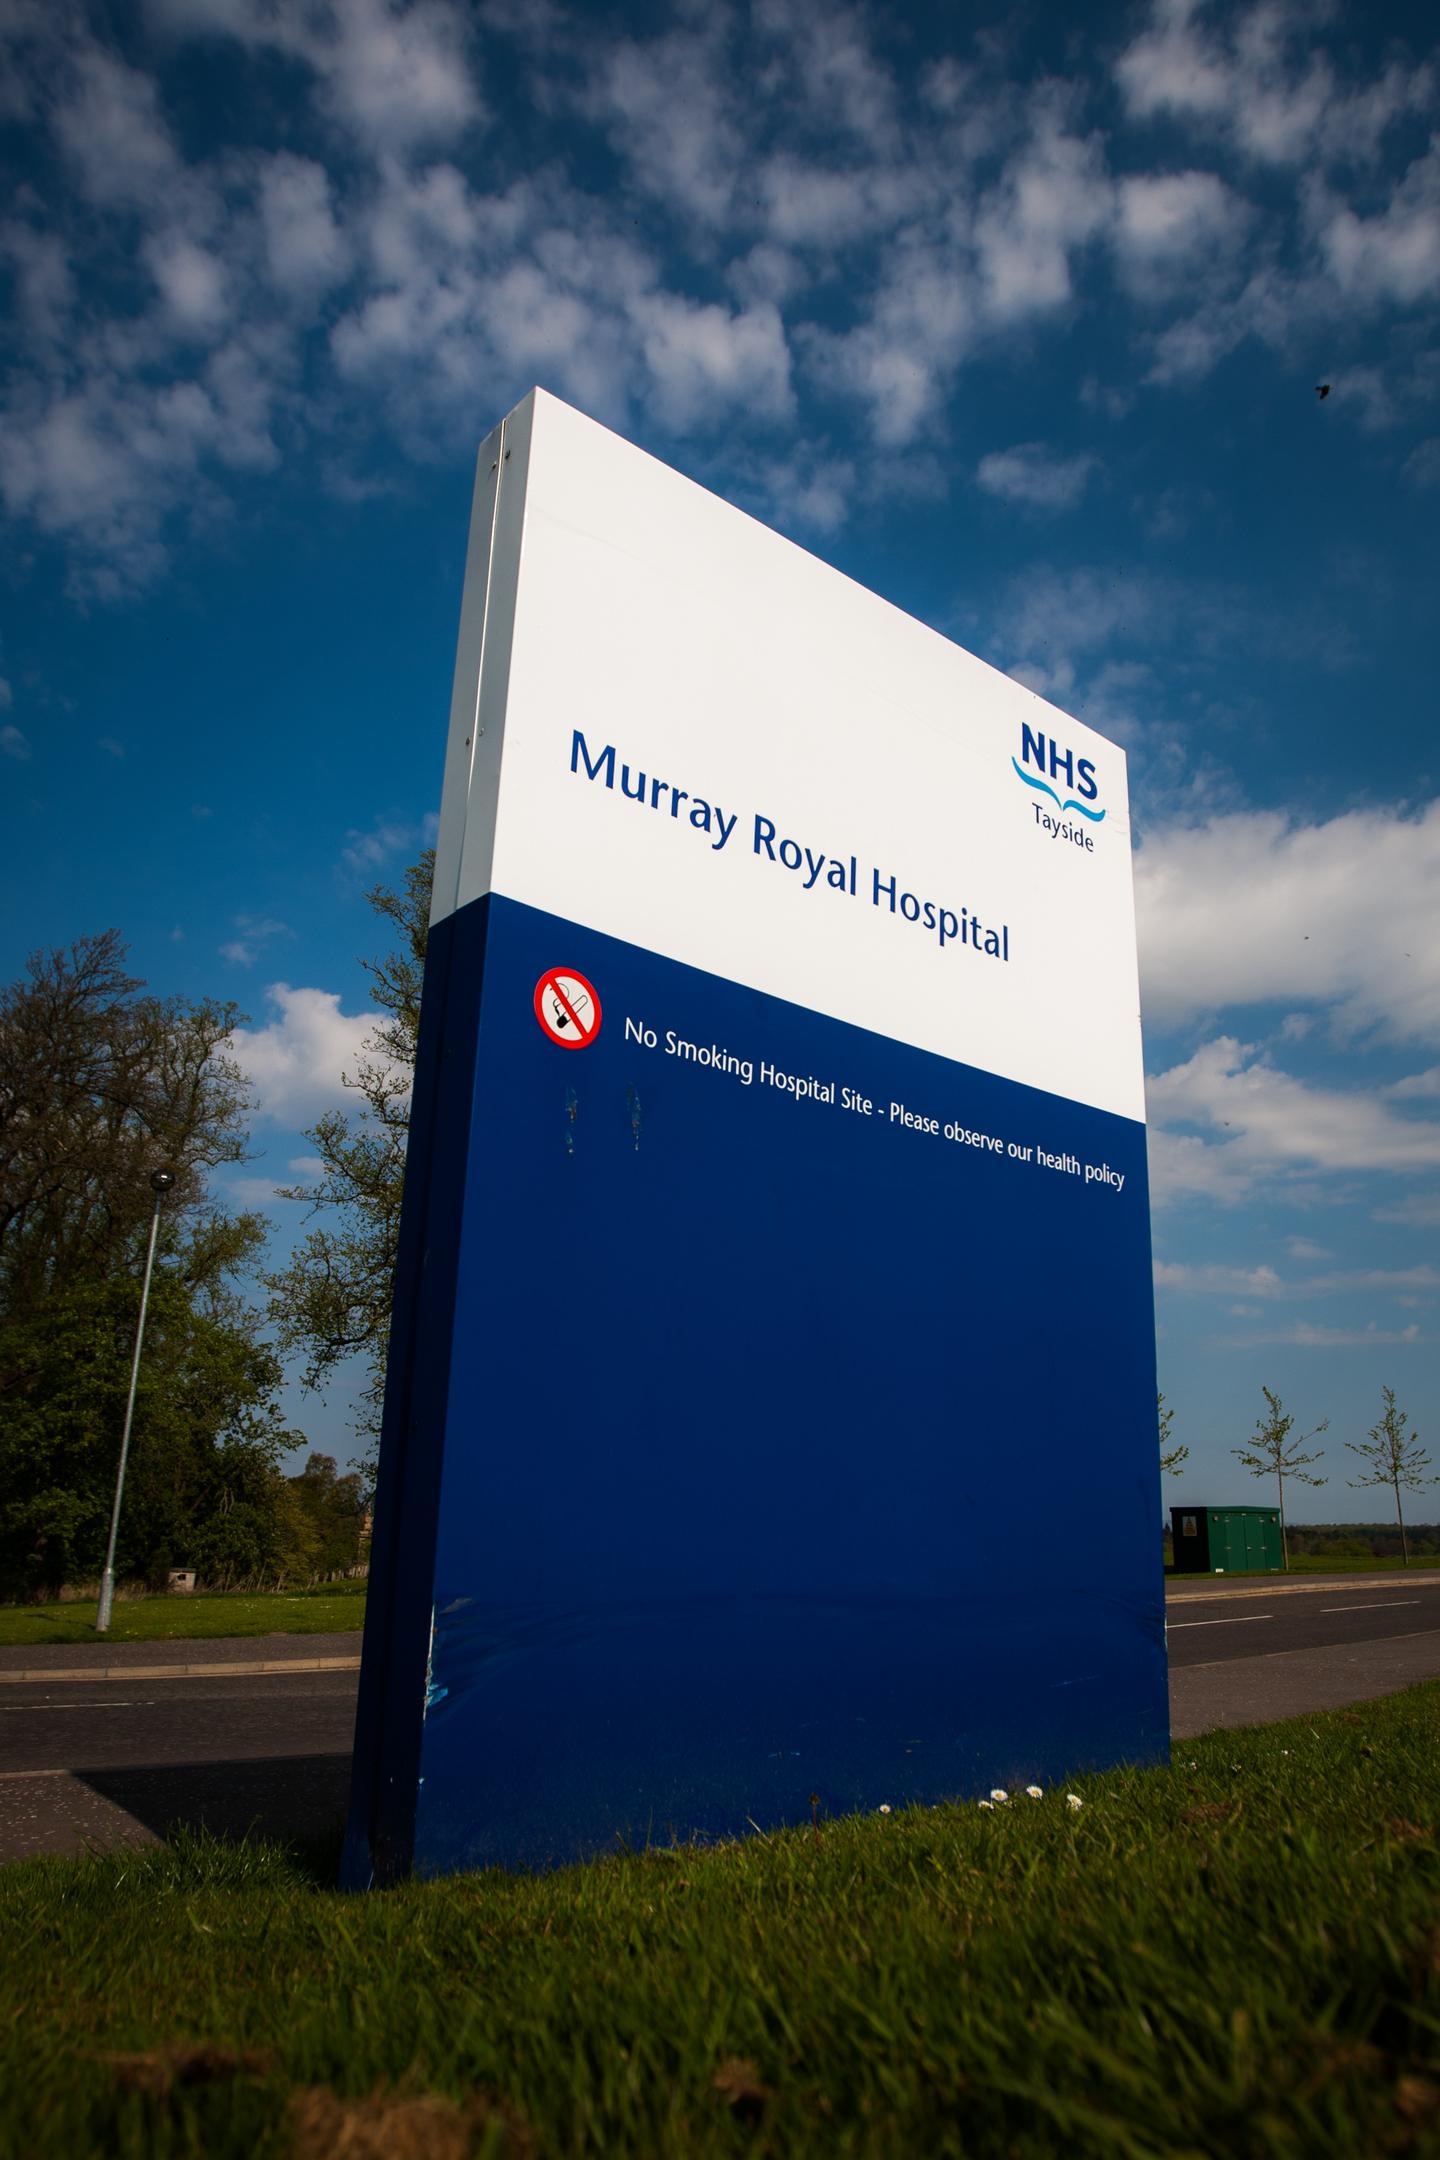 Murray Royal Hospital, Muirhall Road, Perth.